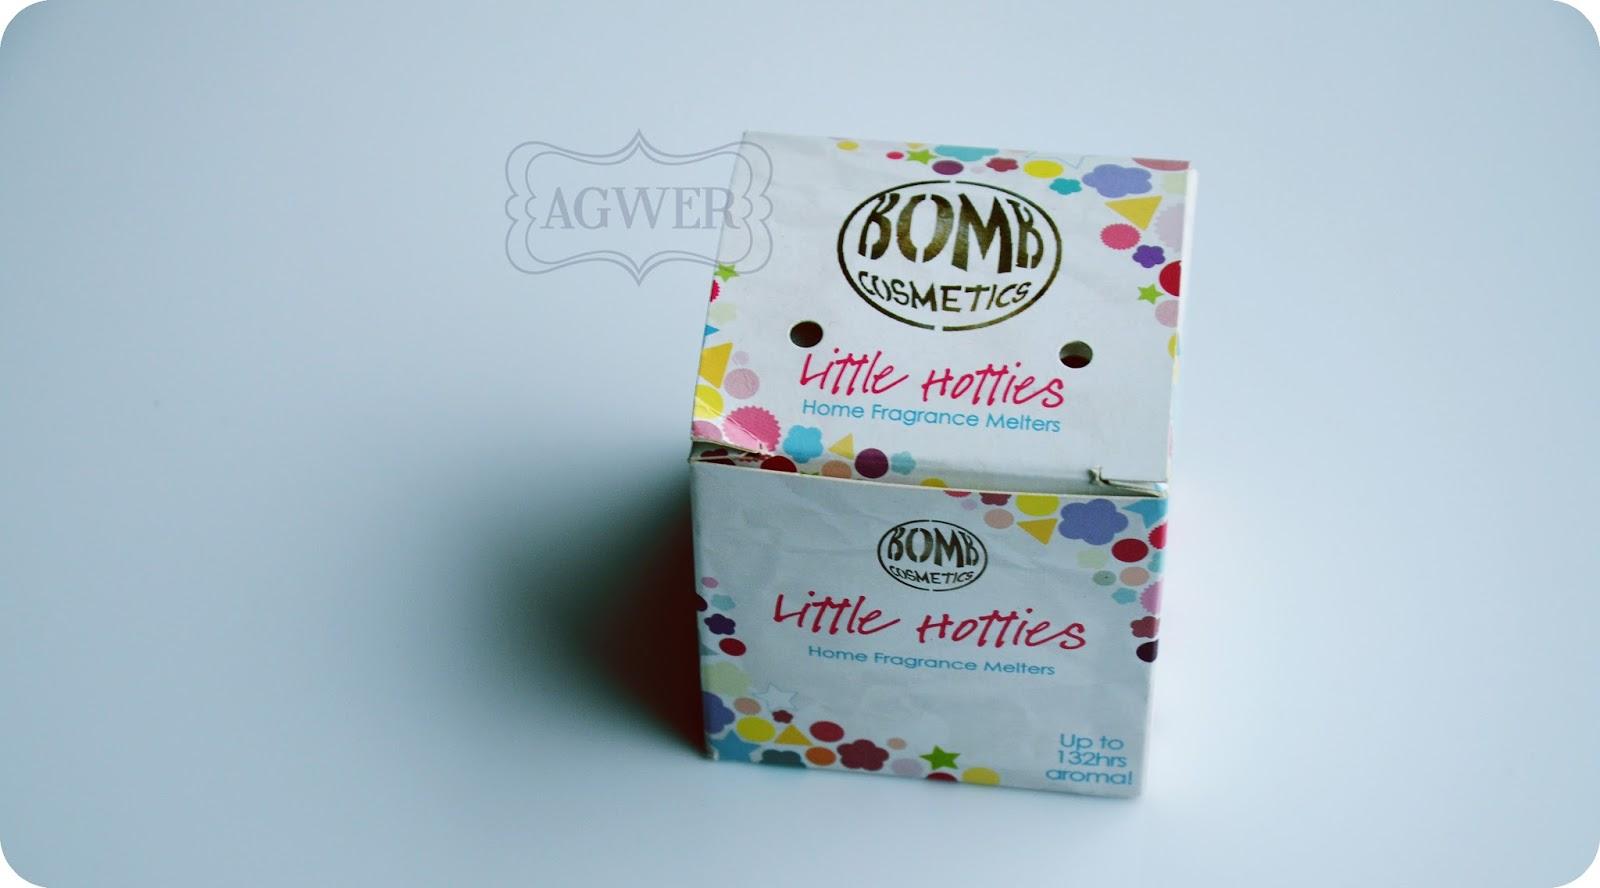 little-hotties-bomb-cosmetics